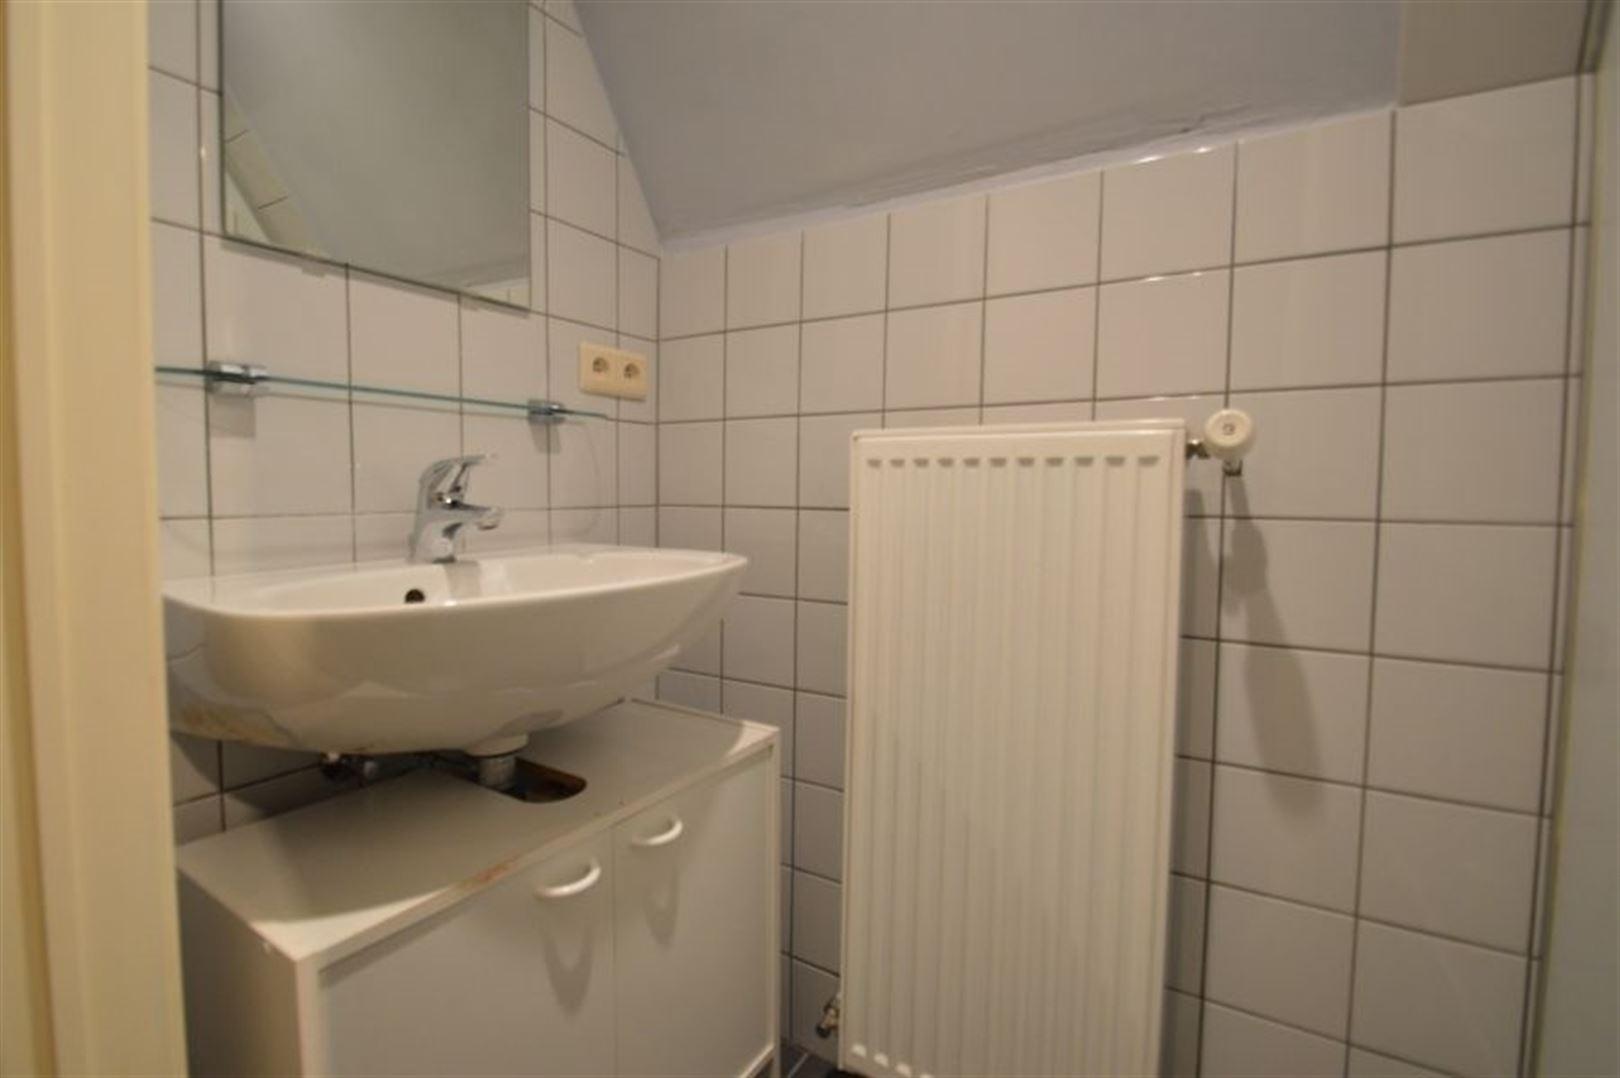 Foto 8 : Appartement te 9200 Dendermonde (België) - Prijs € 470